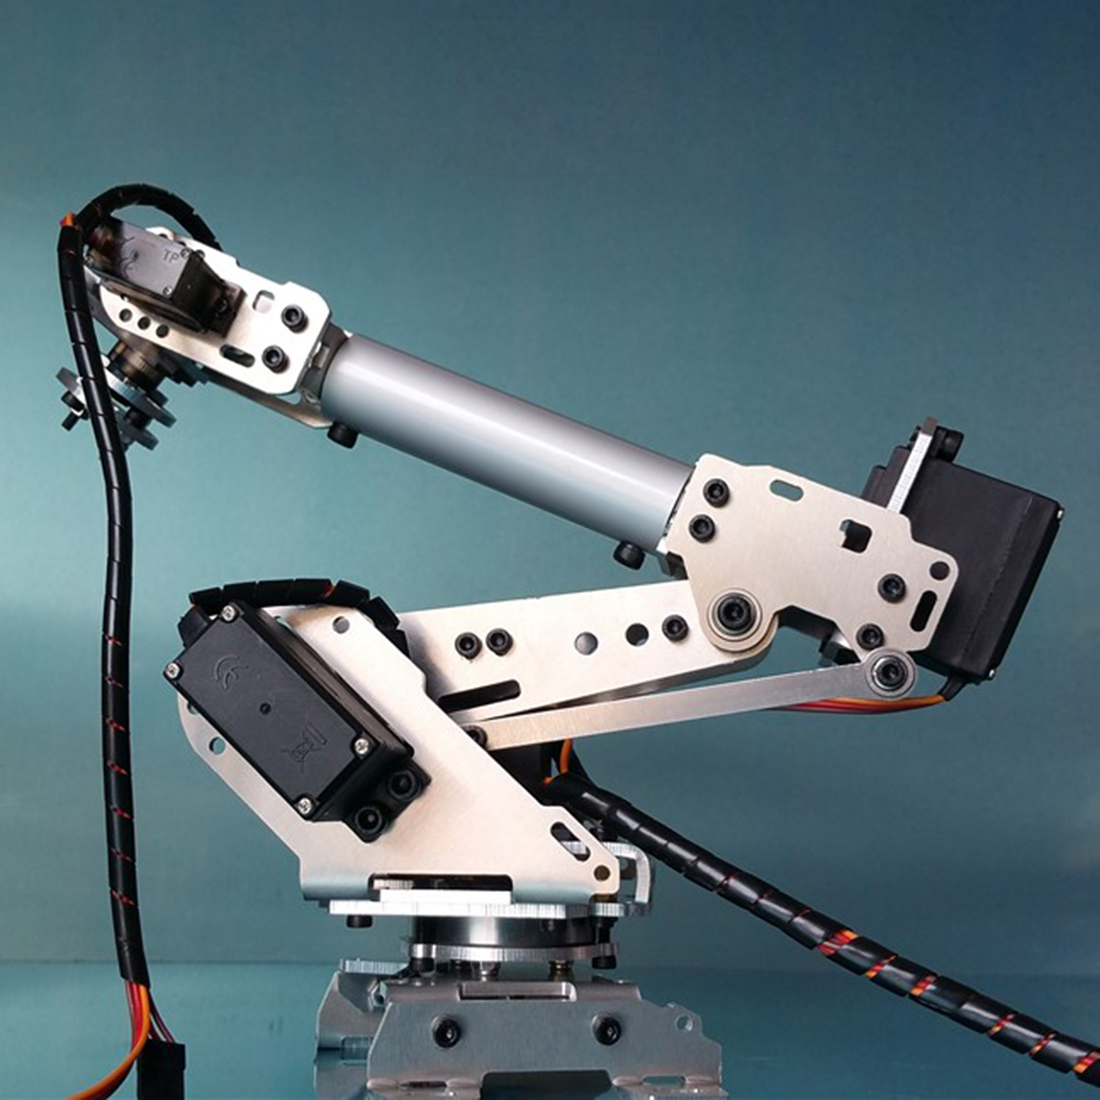 DIY 6DOF Mechanical Arm Intelligent Robot Kit PS2 Remote Control Robot For Arduino Gift For Children